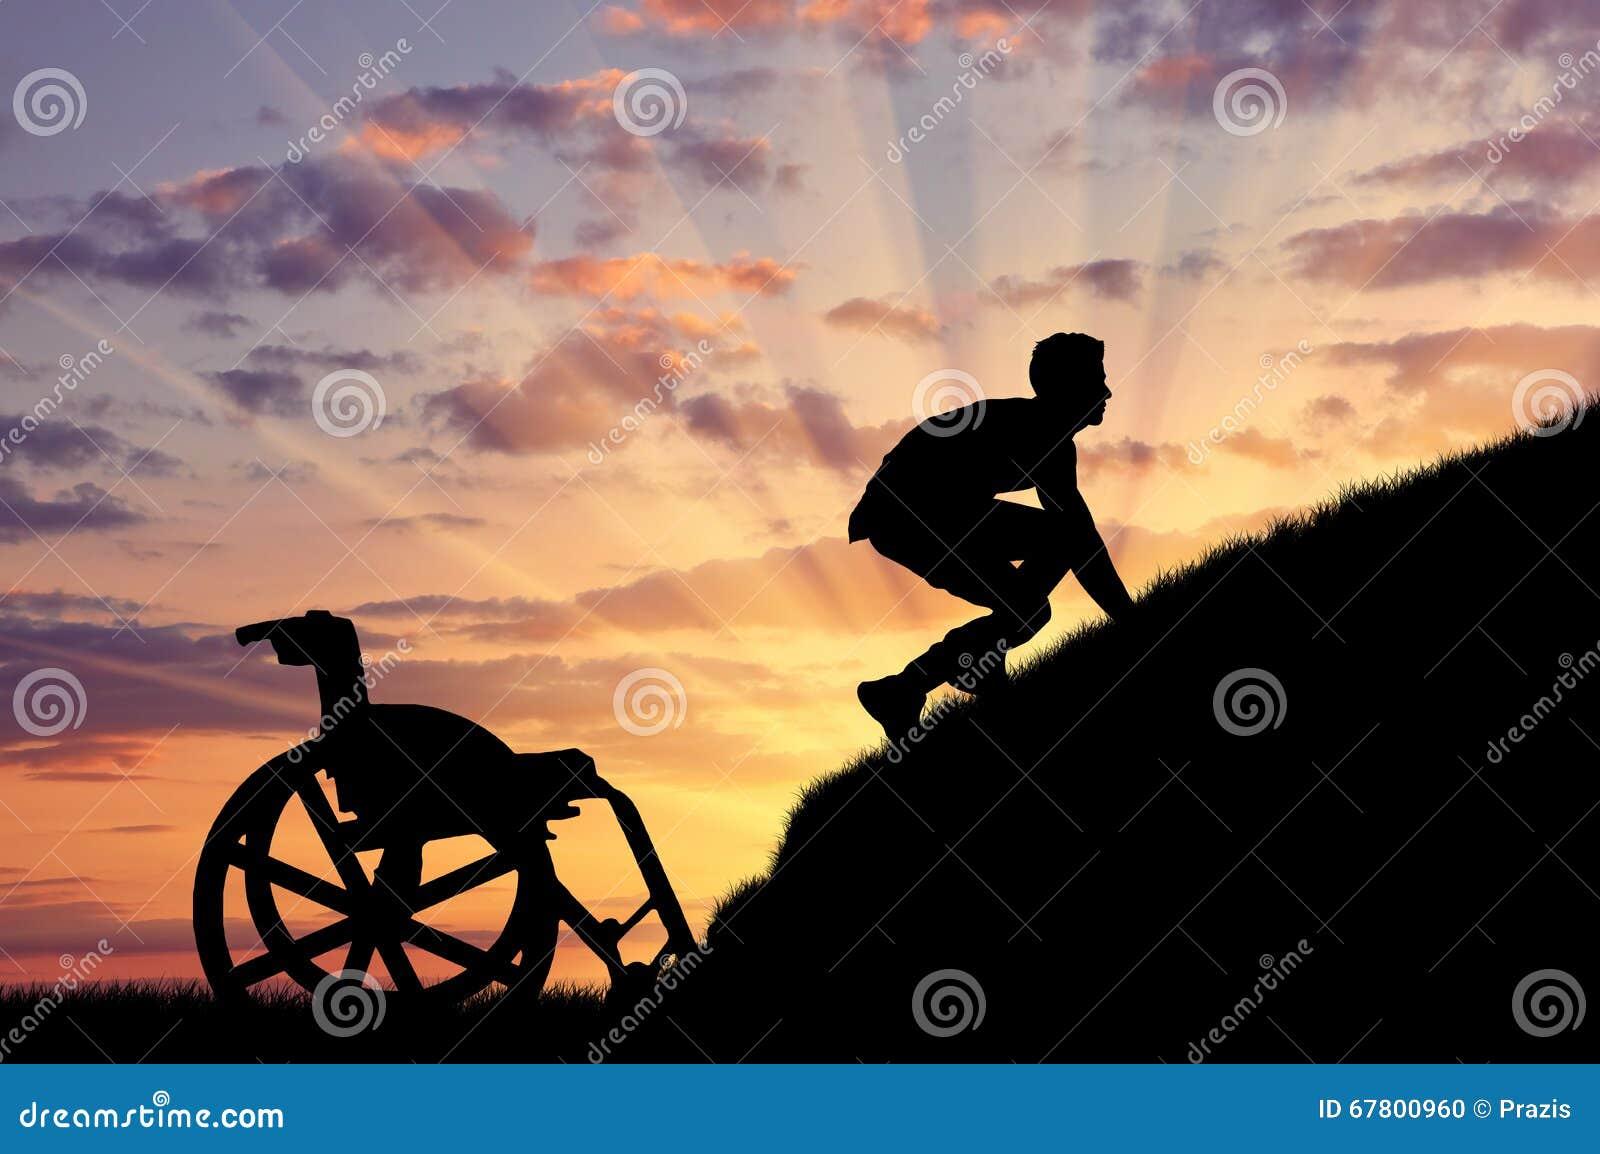 Silueta de la persona discapacitada